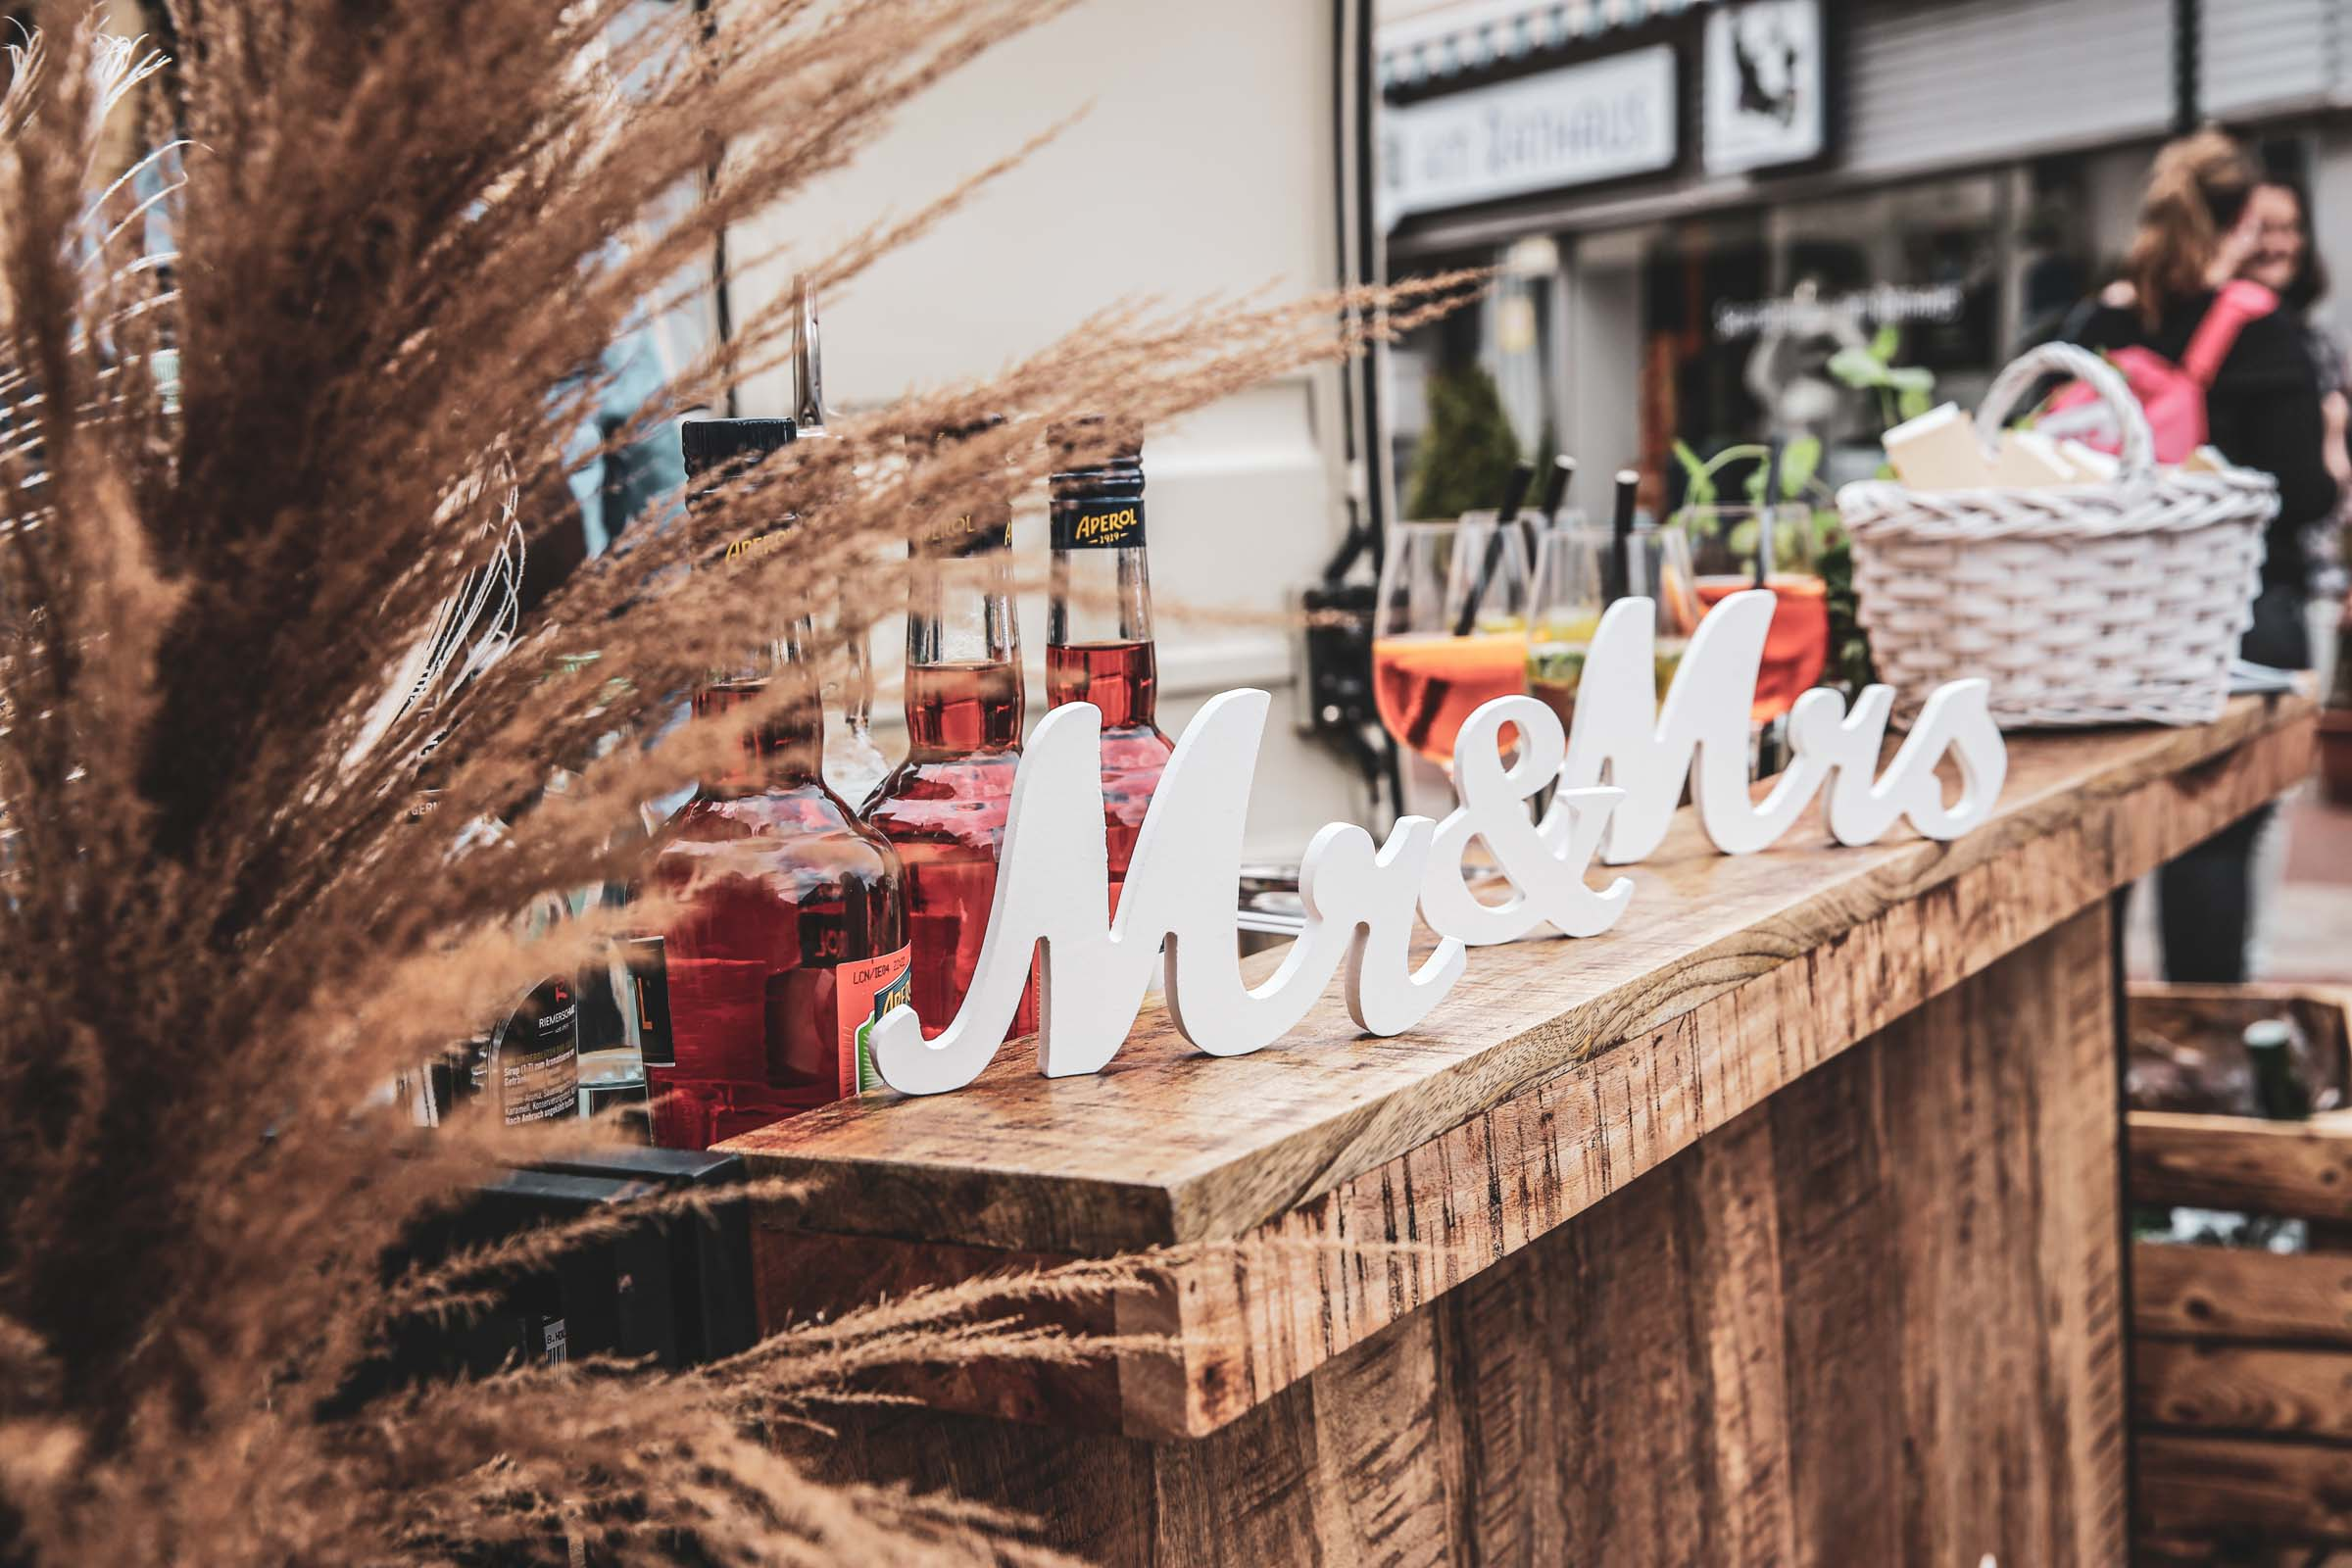 Cocktailservice | Hannover | Mobile | Bar | Bulli | VW | Barformat | Hochzeit | Barkeeper | Getränke | Sektempfang | Trauung | Standesamt | Ginbar | Mr | Mrs | Sektbar | Buchen | Mieten | Anfragen